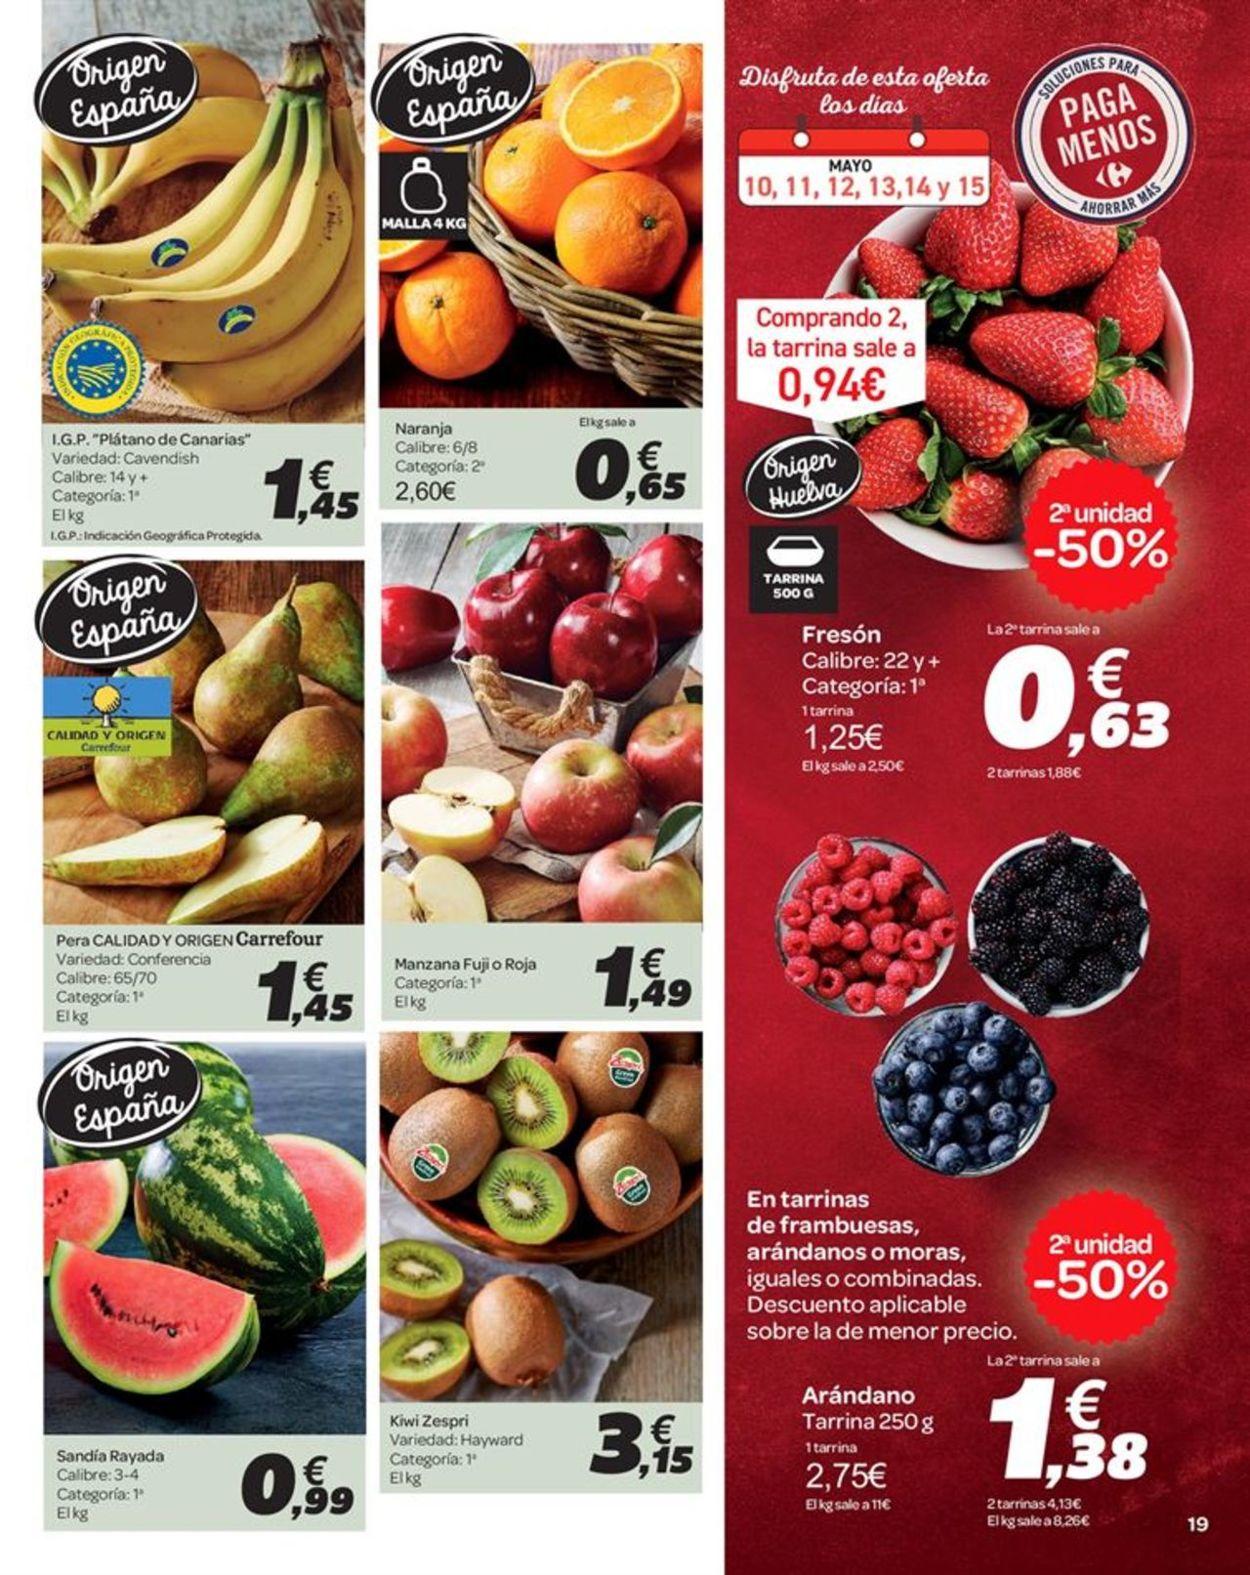 Carrefour Folleto - 10.05-23.05.2019 (Página 19)